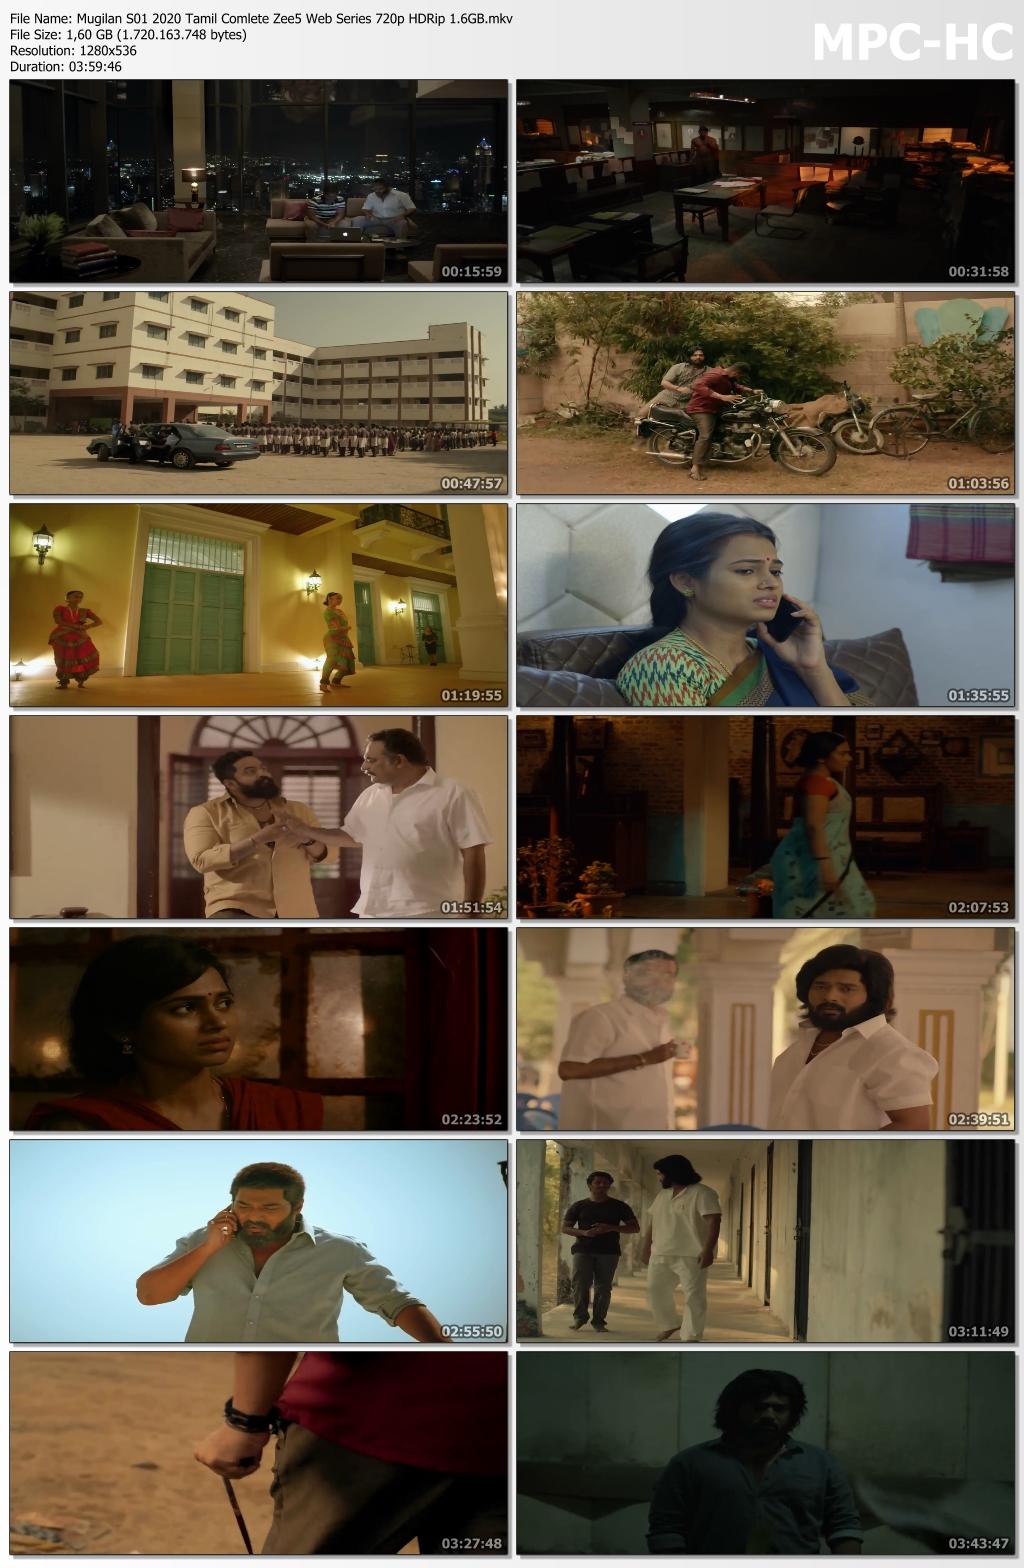 Mugilan-S01-2020-Tamil-Comlete-Zee5-Web-Series-720p-HDRip-1-6-GB-mkv-thumbs